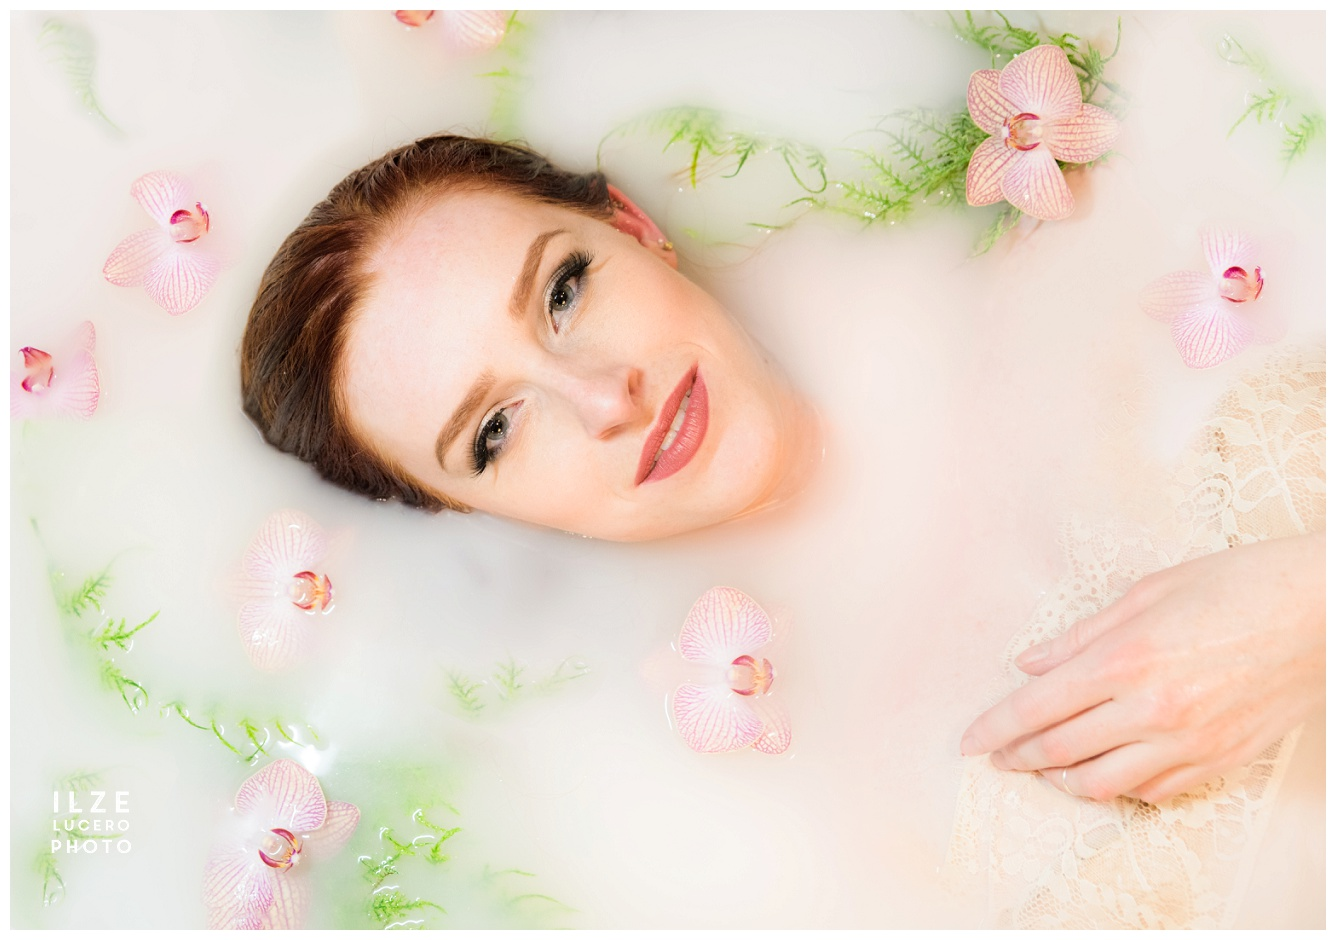 Milk bath Fashion Beauty Photo Inspiration